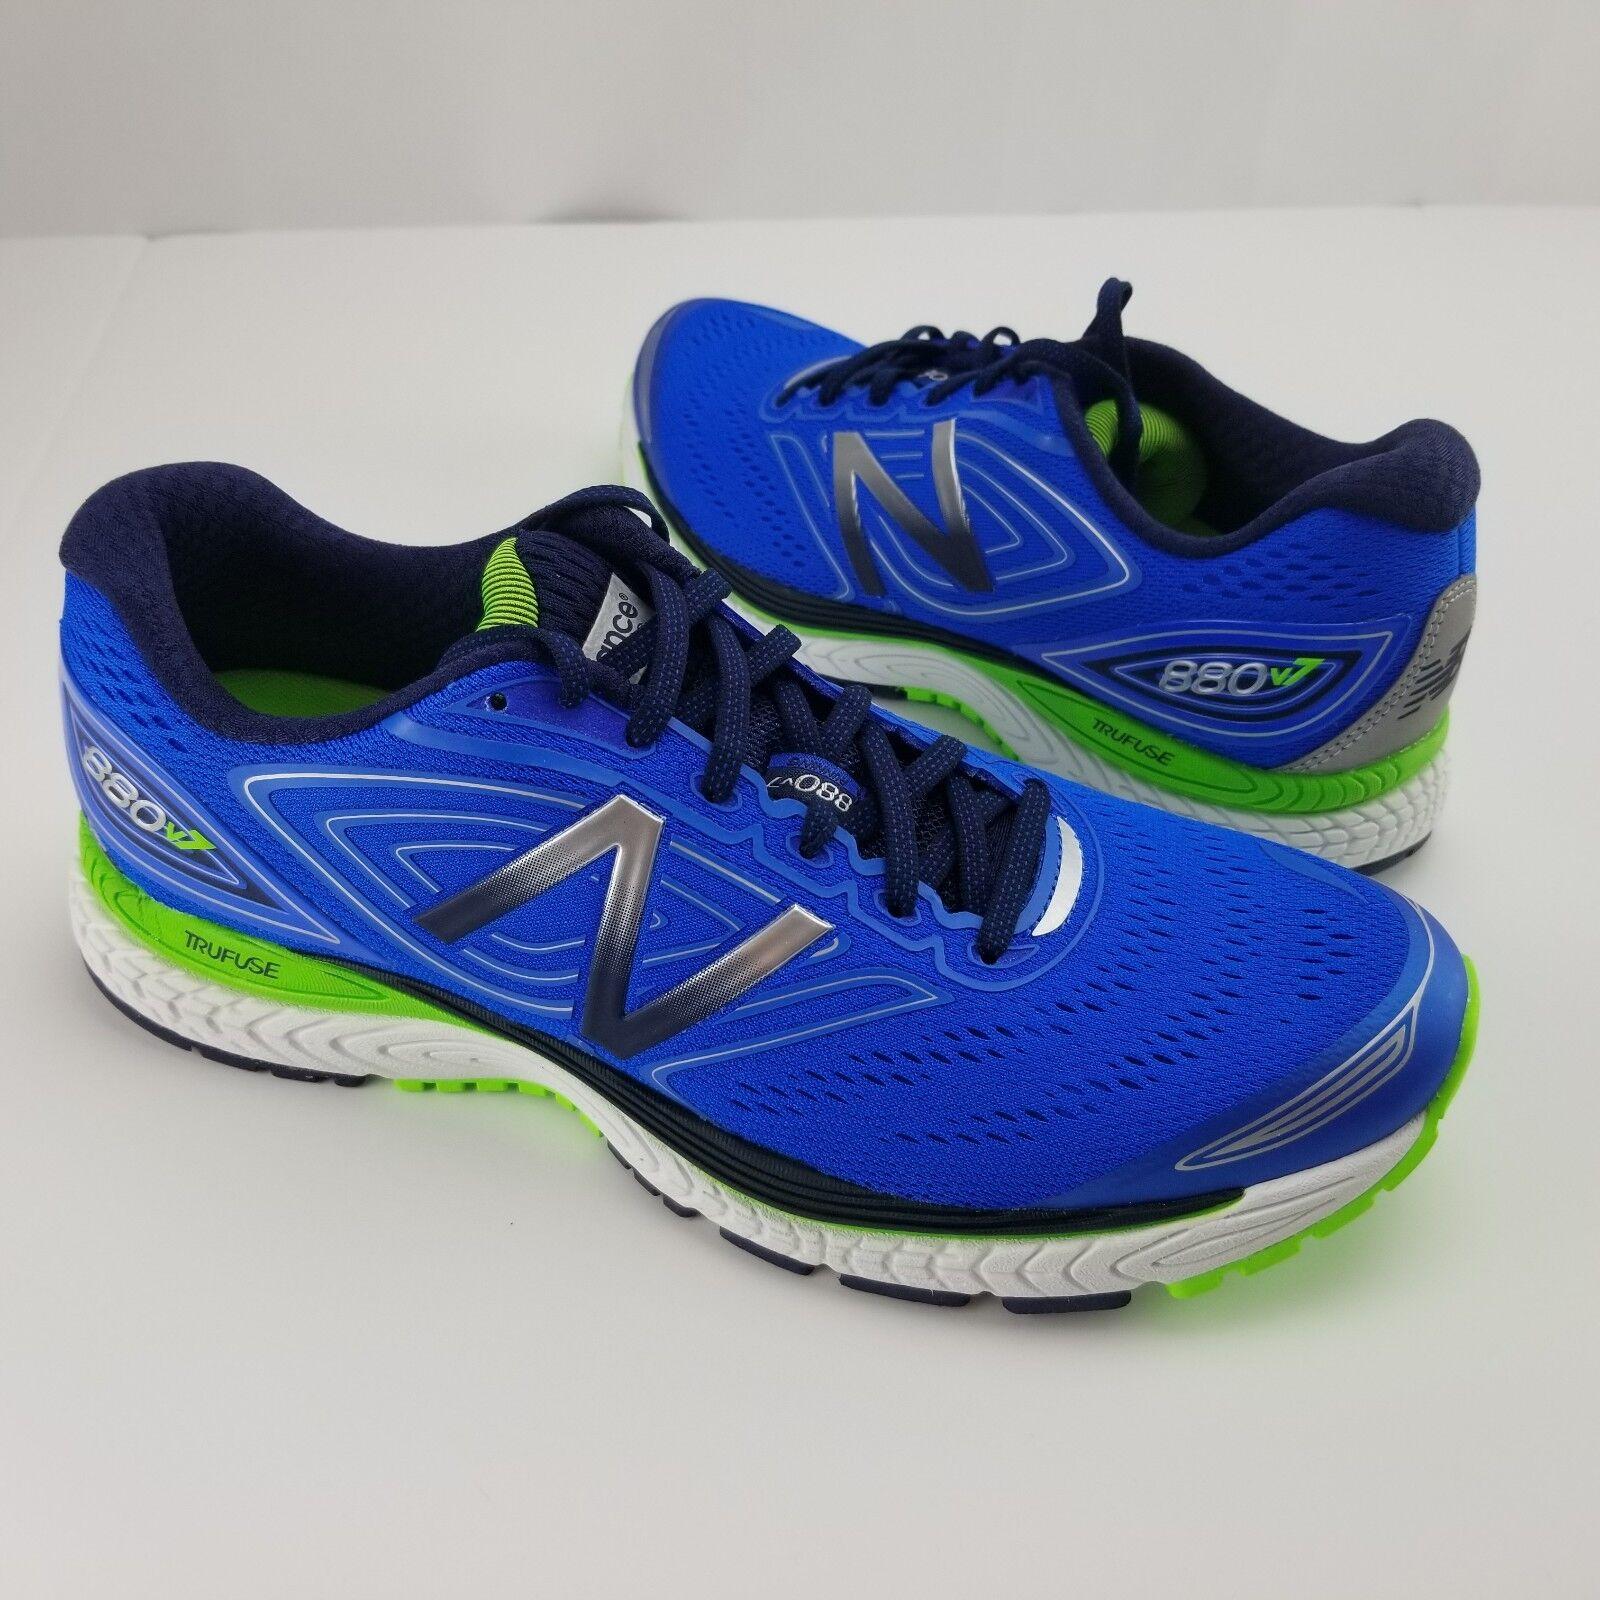 New Balance Men's 880v7 shoes bluee Sz 8 11 NB Running shoes